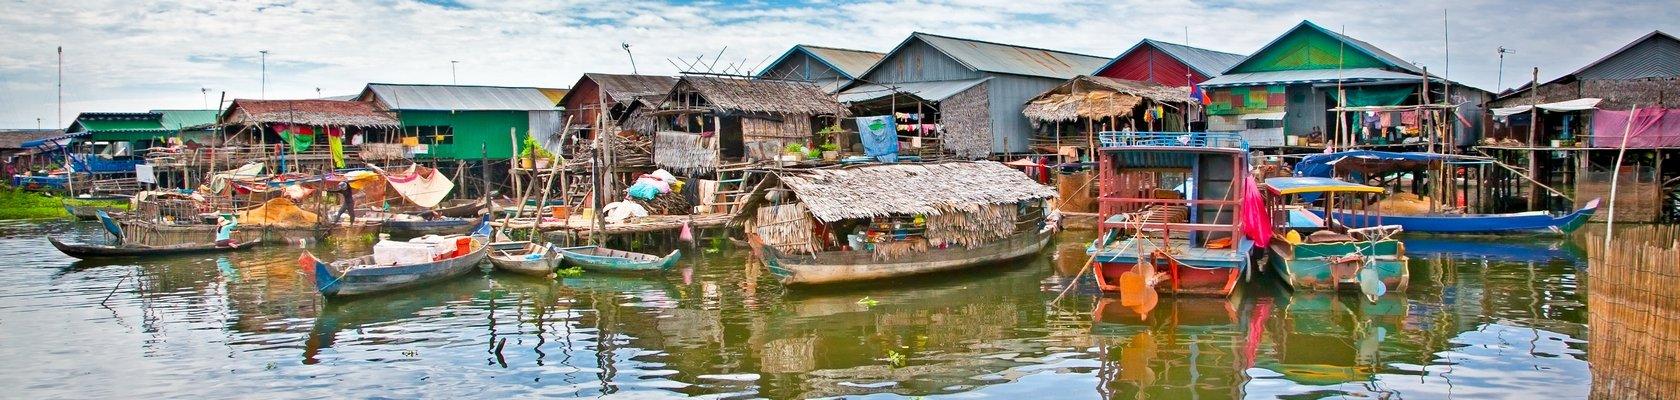 Drijvende huizen in Battambang